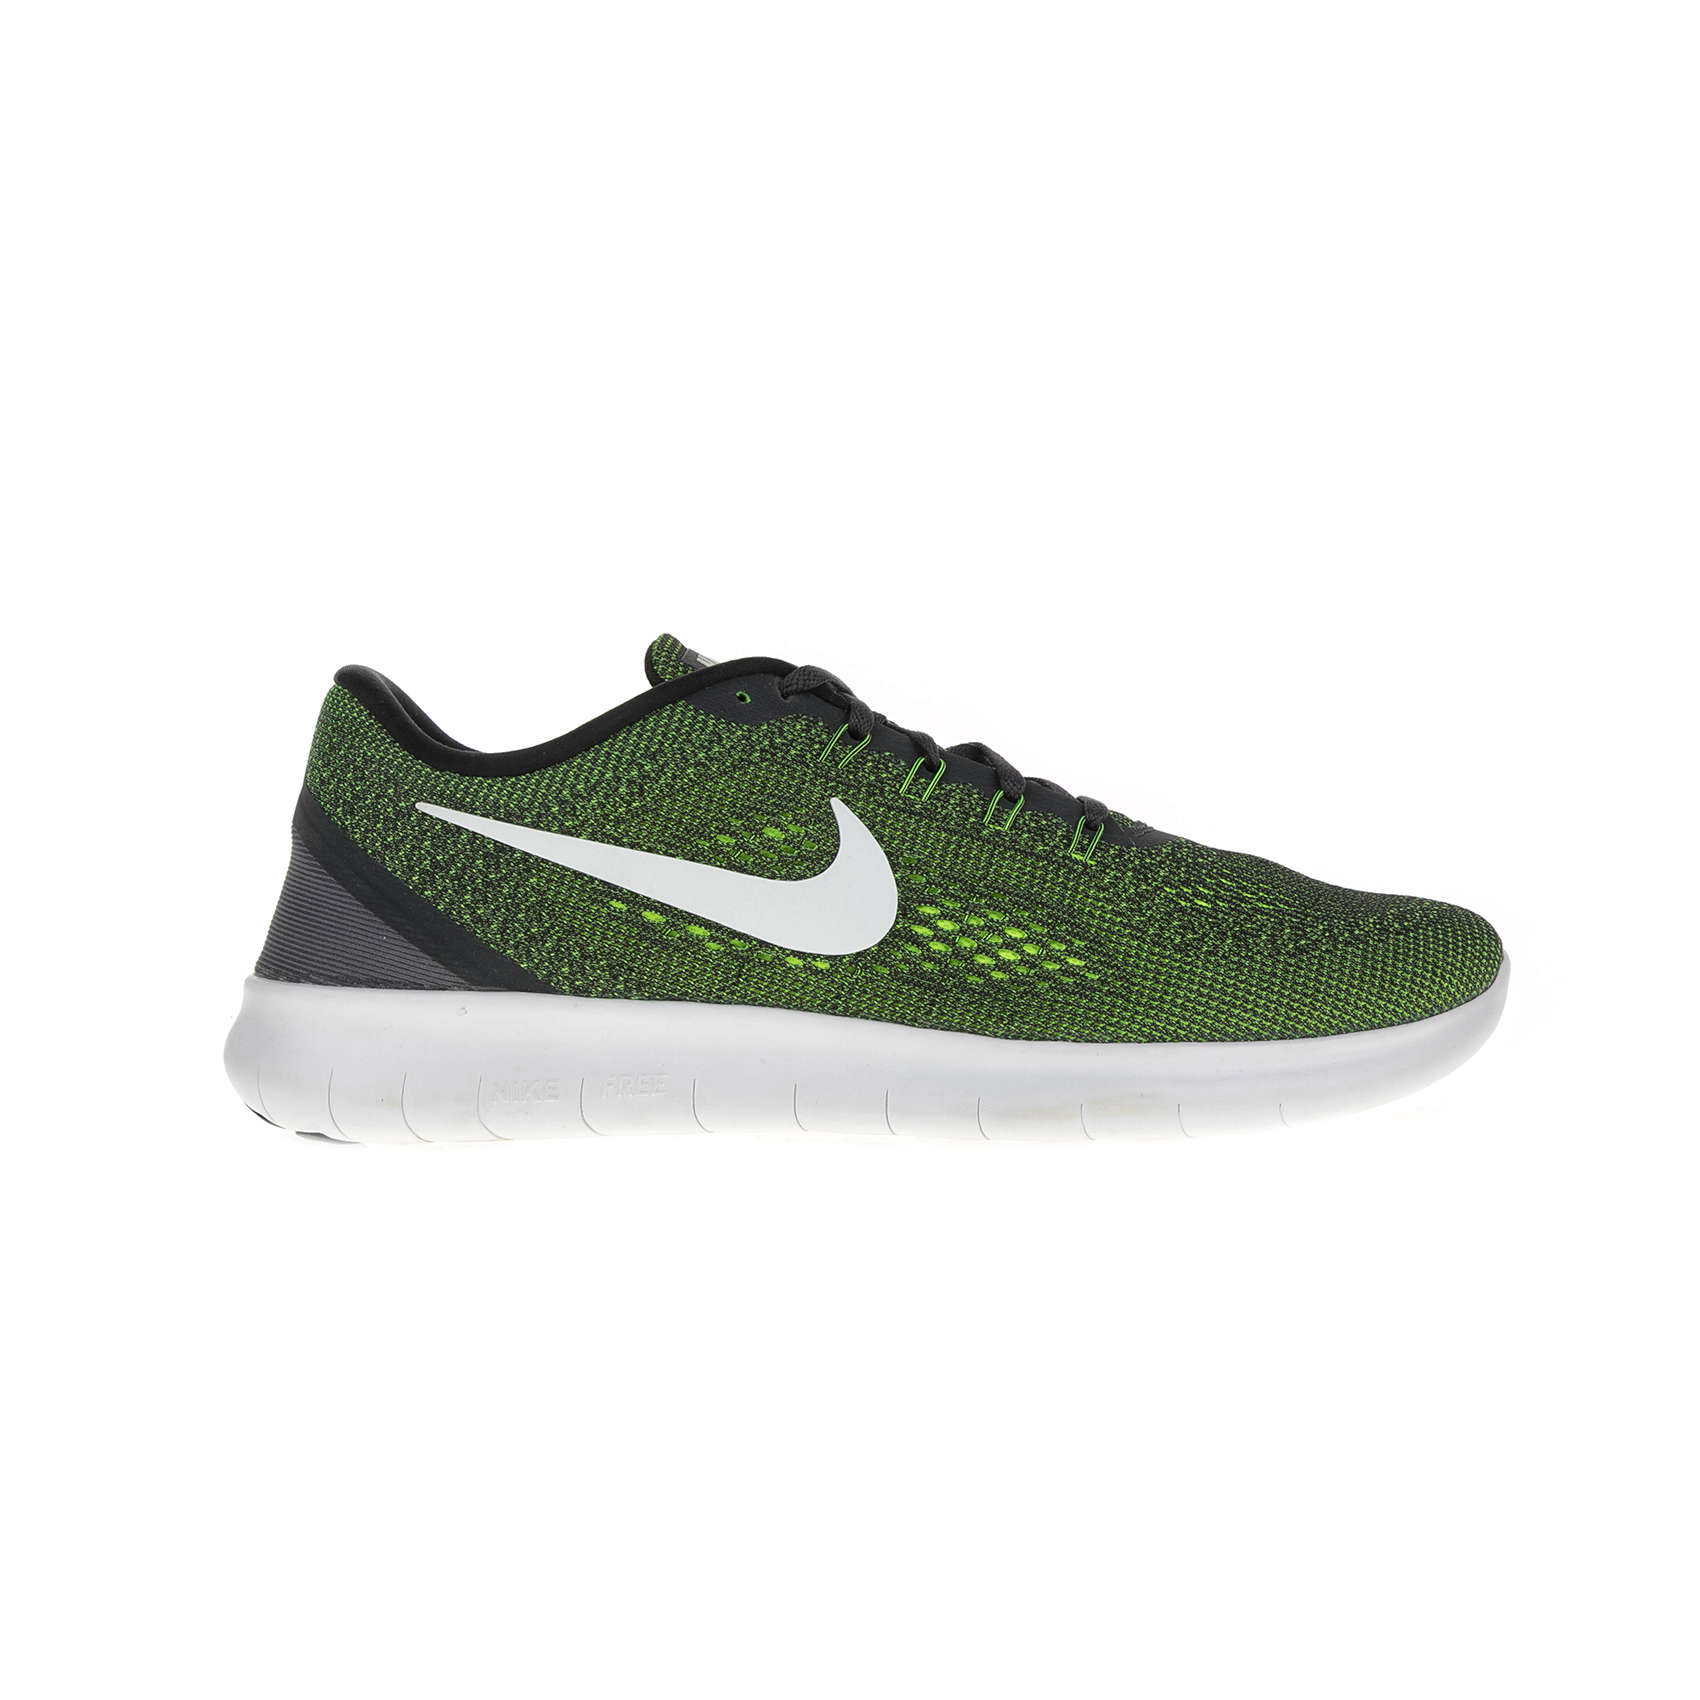 NIKE – Ανδρικά αθλητικά παπούτσια Nike FREE RN πράσινα